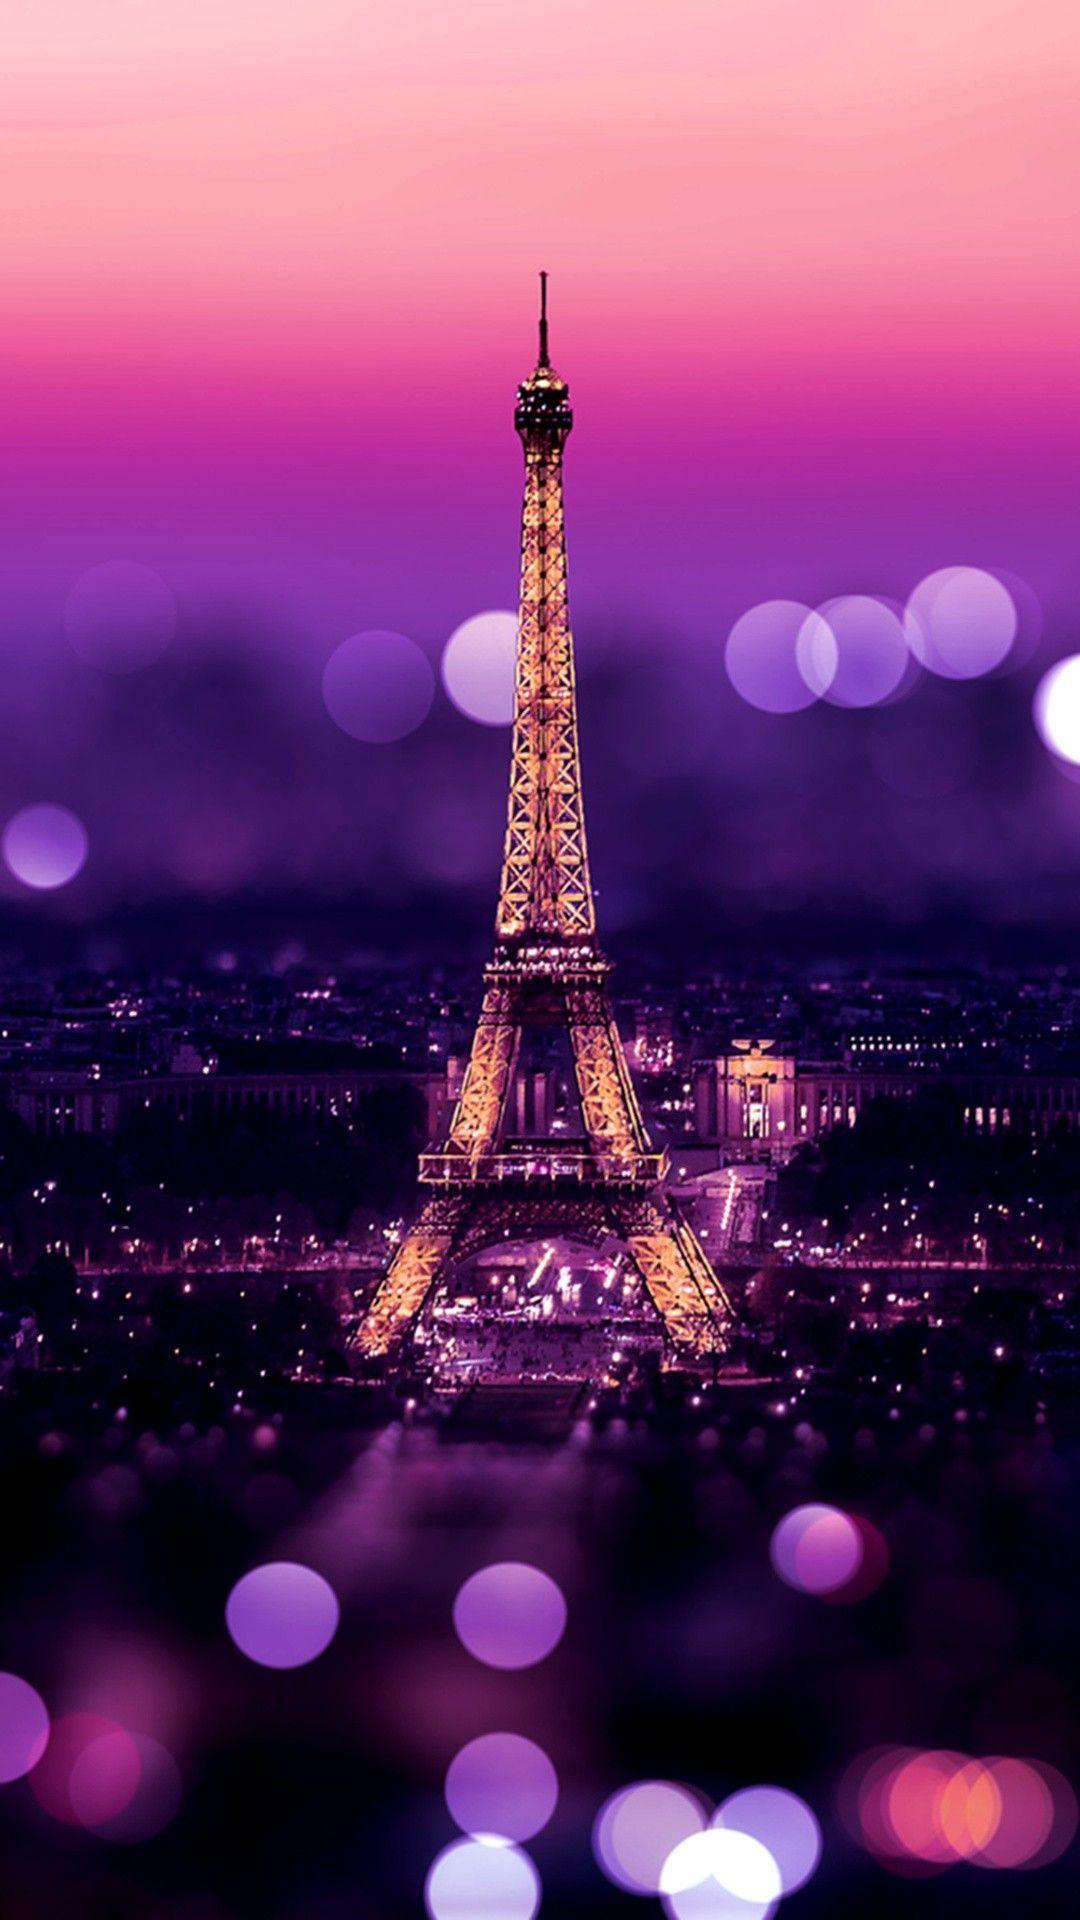 55 Pink Eiffel Tower Paris France Wallpapers Download At Wallpaperbro Paris Wallpaper Iphone Paris Wallpaper France Wallpaper